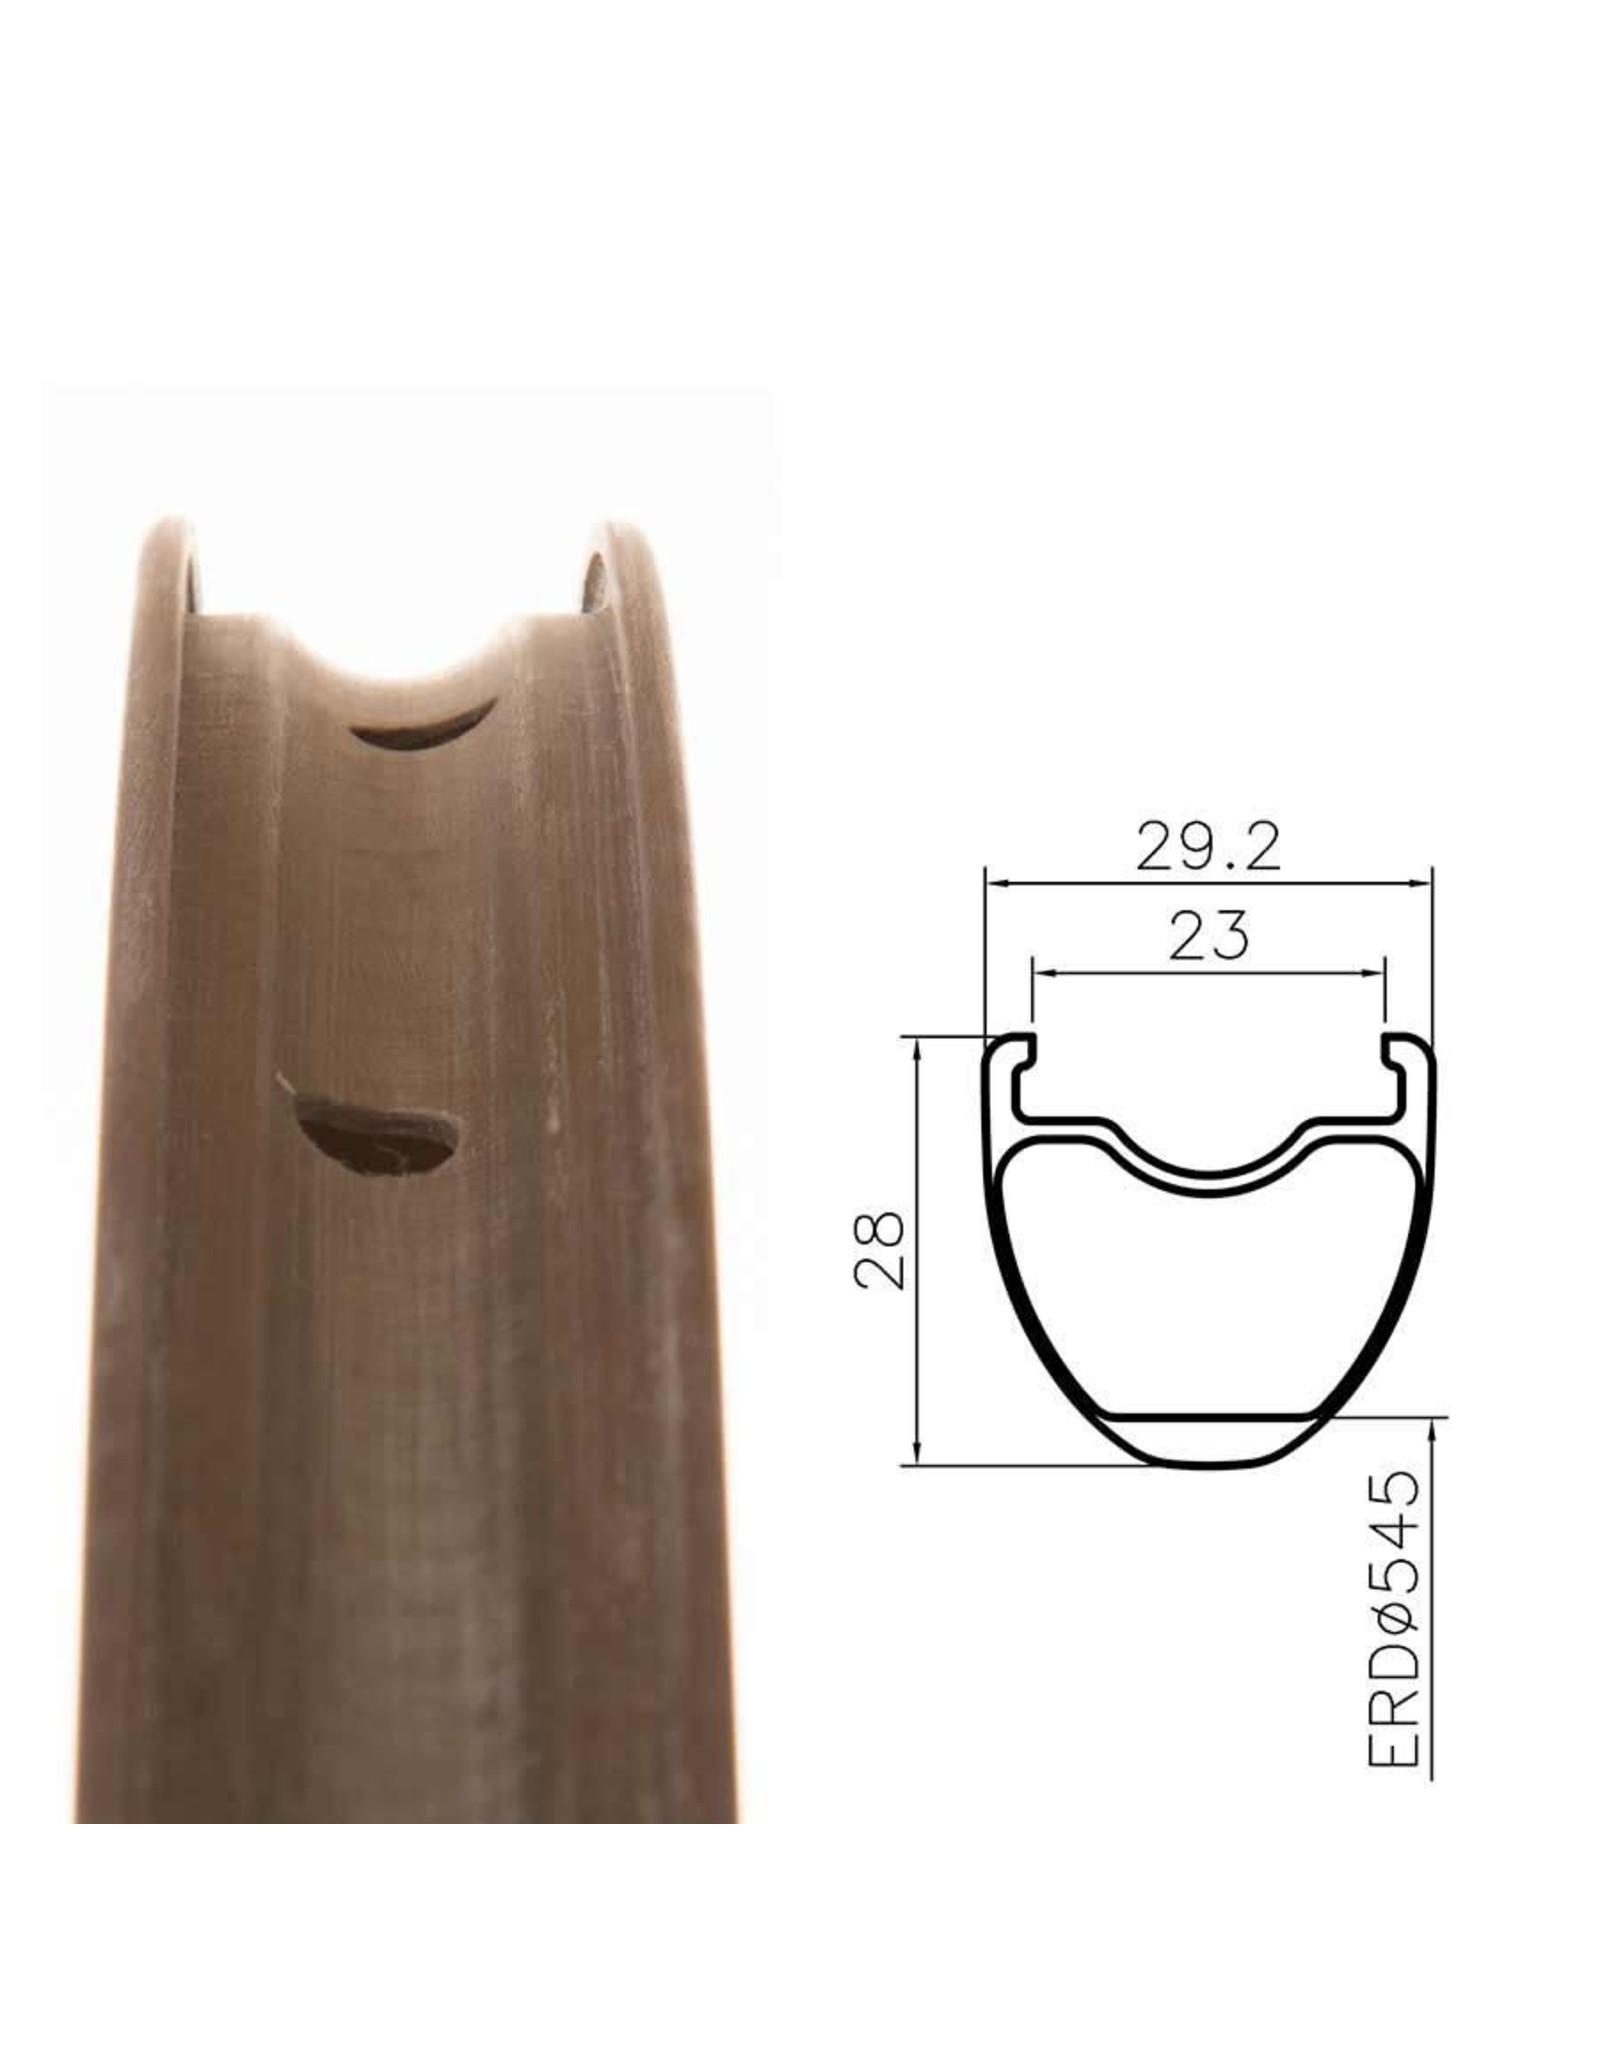 Eclypse Eclypse, S9 Gravel 650B, Wheelset, Front and Rear, 650B / 584, Holes: F: 28, R: 28, 12mm TA, F: 100, R: 142, Disc Center Lock, Shimano HG 11, Pair